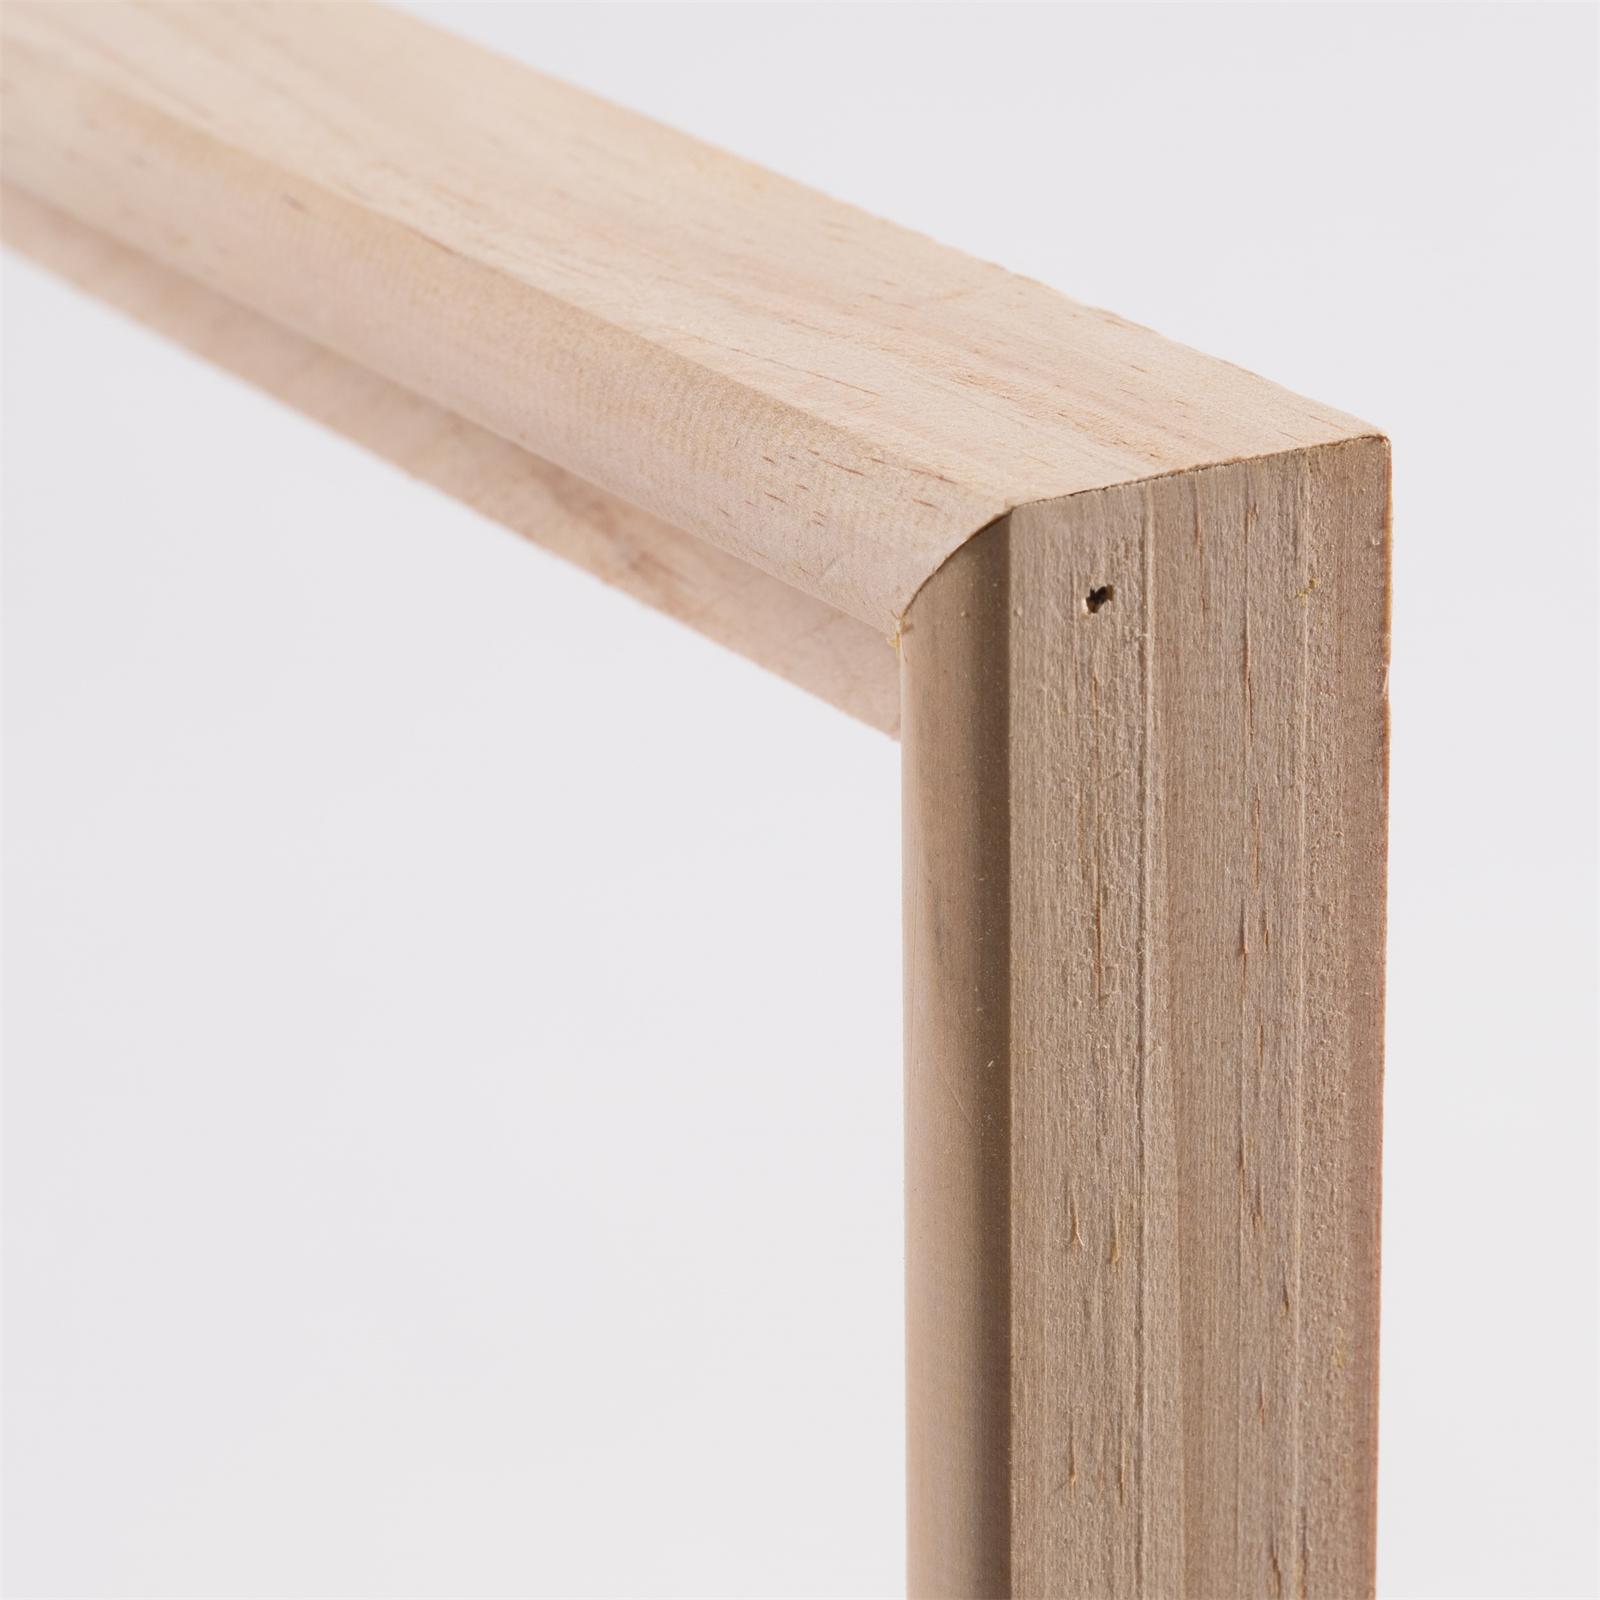 2 Wood Tray Shadow Gap Frames For Blank Stretched Artist